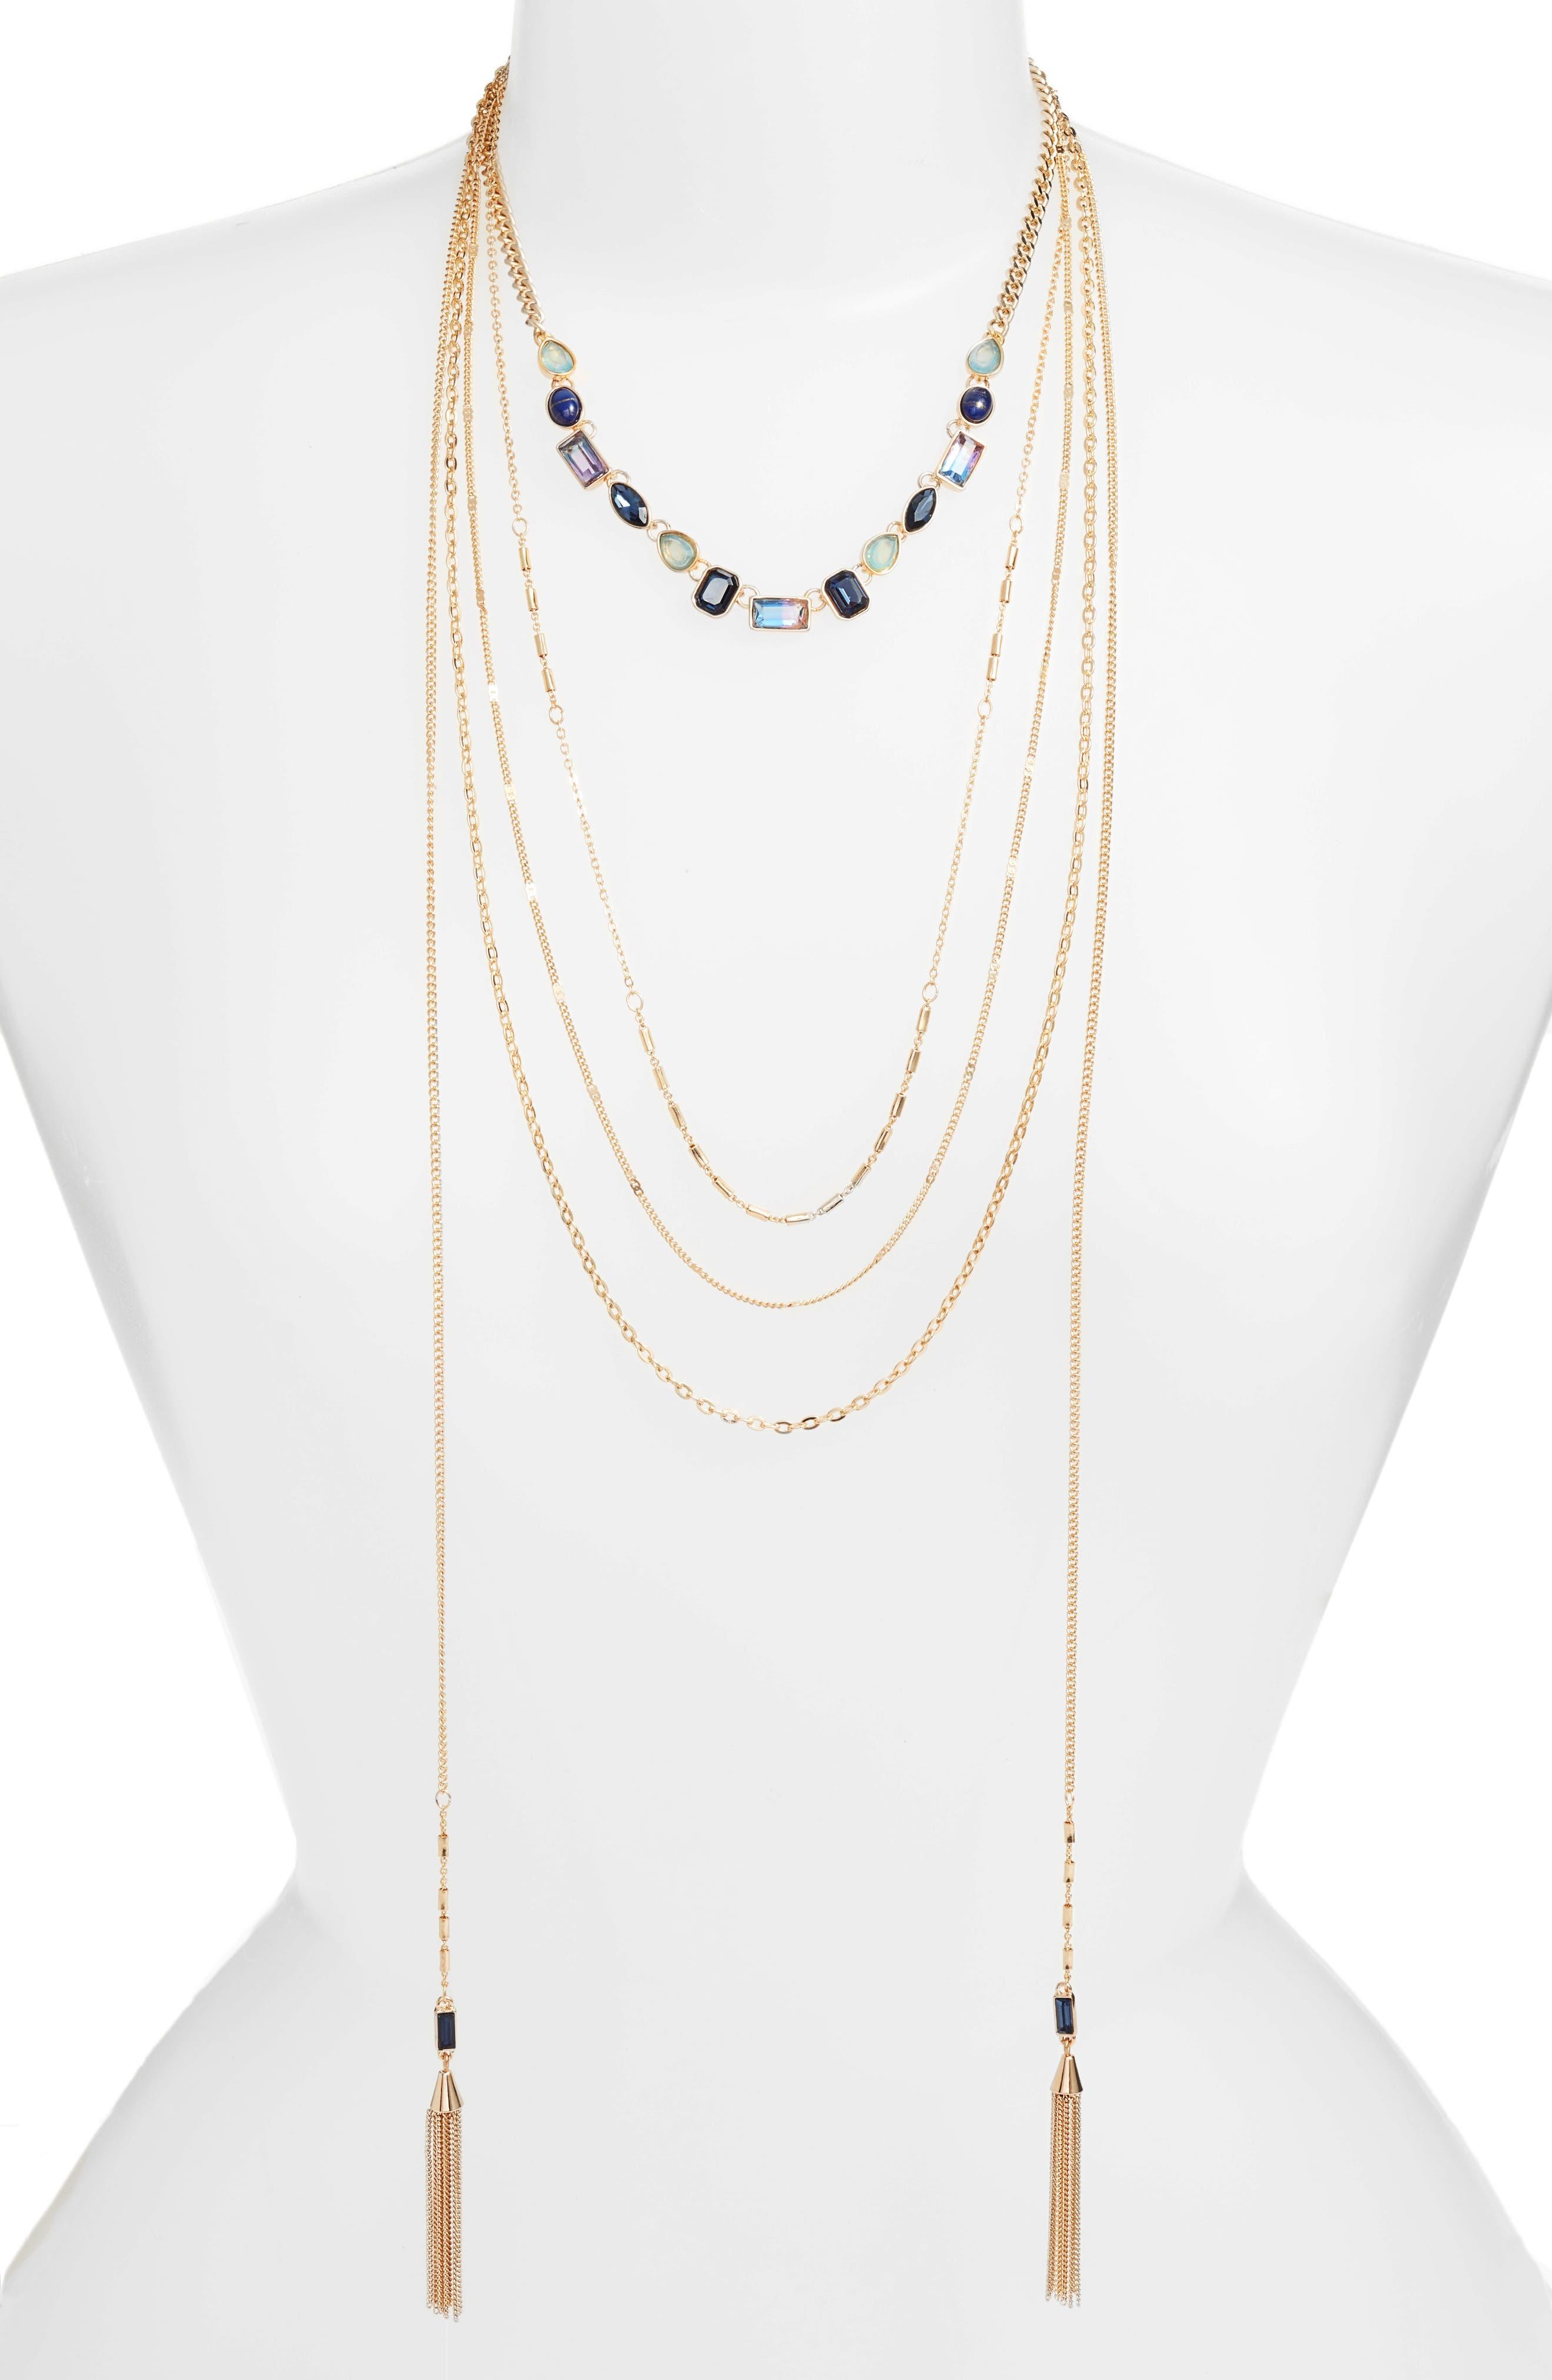 Crystal Multistrand Choker Necklace,                             Main thumbnail 1, color,                             Blue Multi- Gold